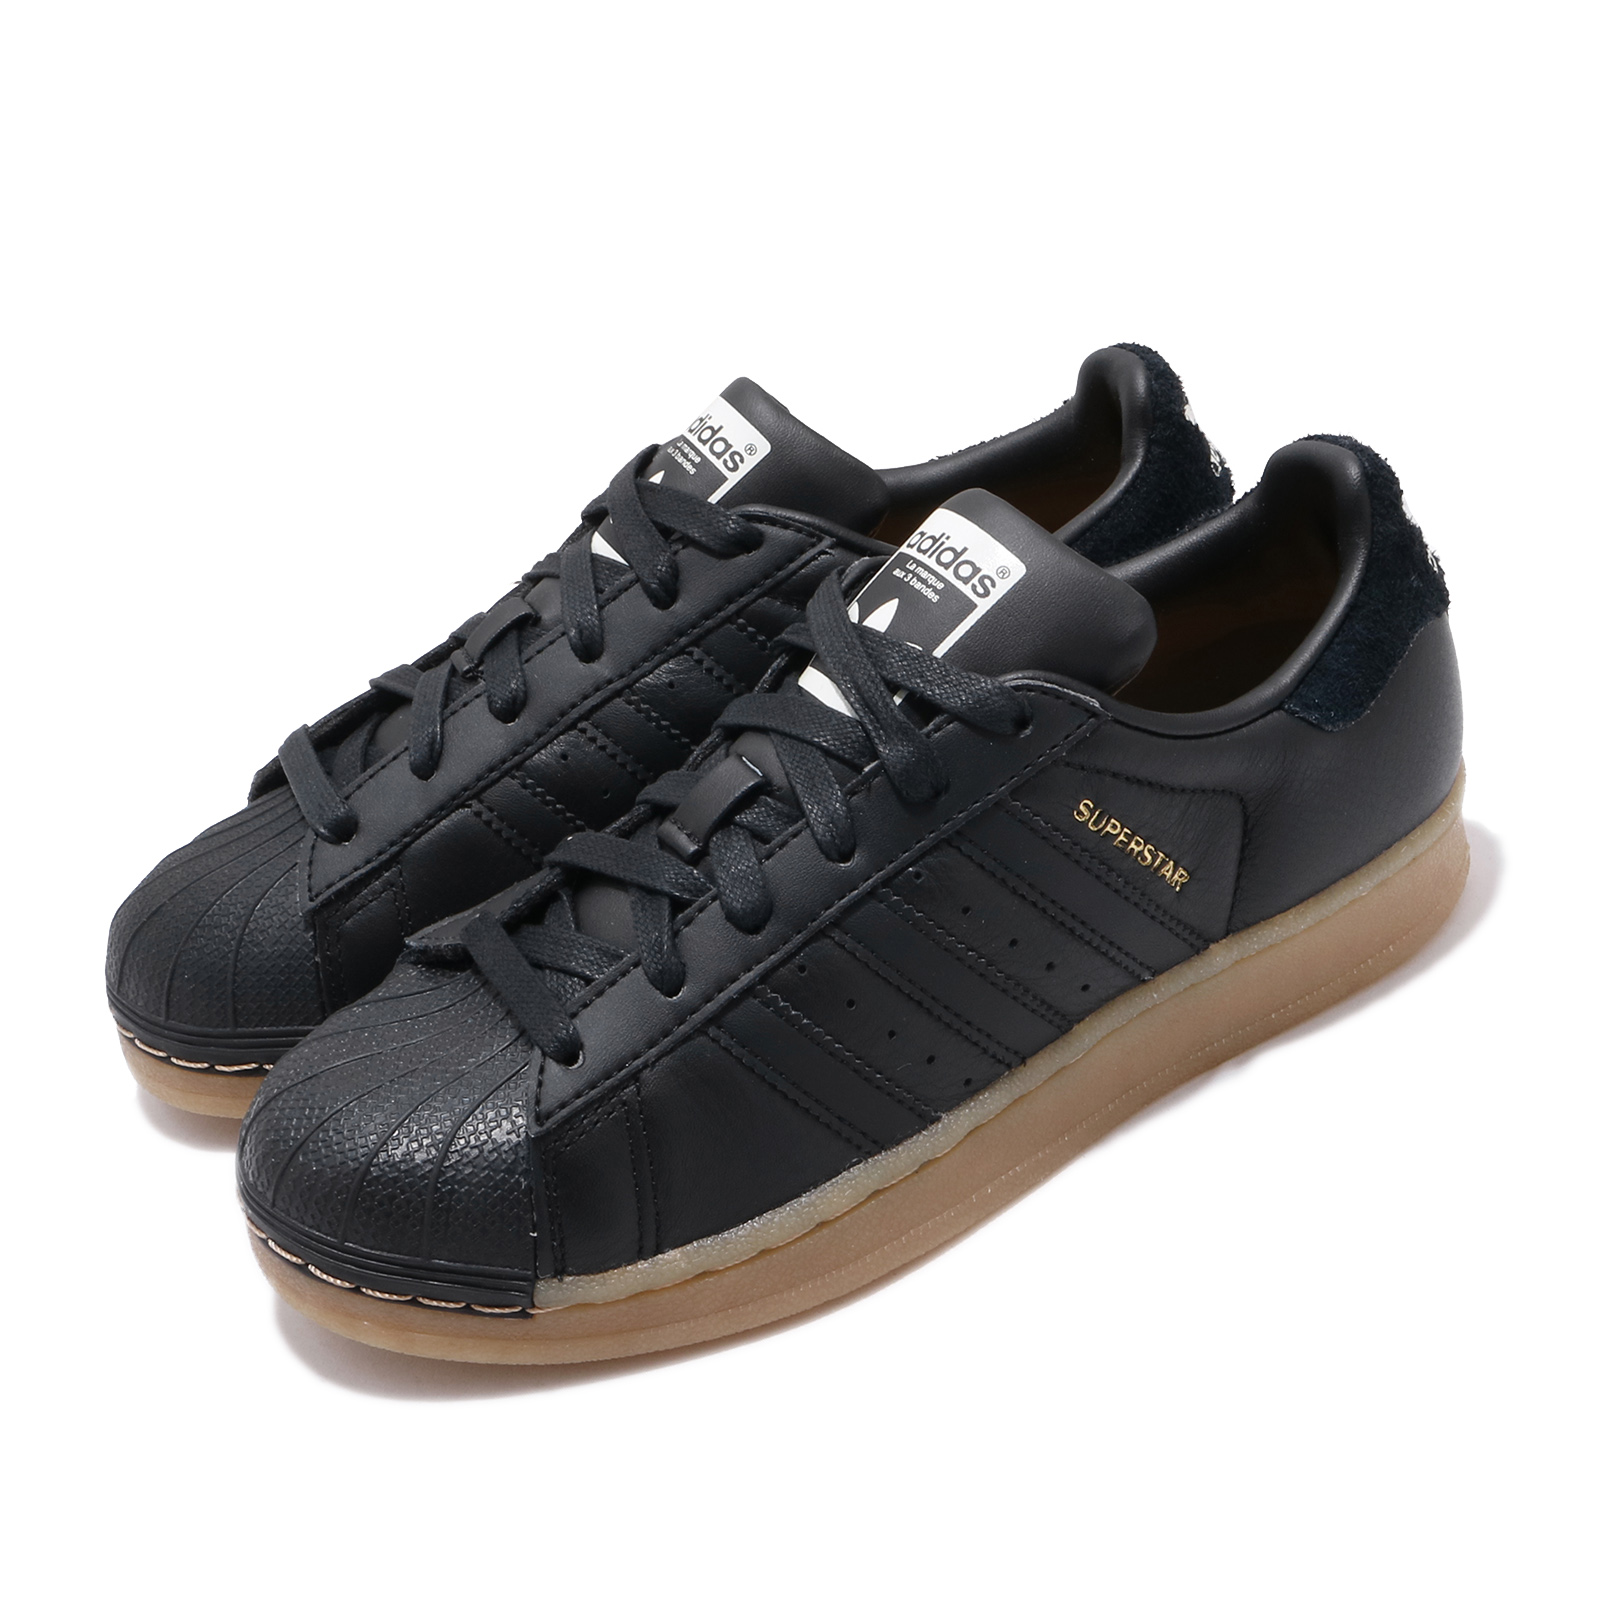 adidas 休閒鞋 Superstar W 復古 低筒 女鞋 海外限定 愛迪達 三葉草 貝殼頭 穿搭 黑 金 B37148 B37148